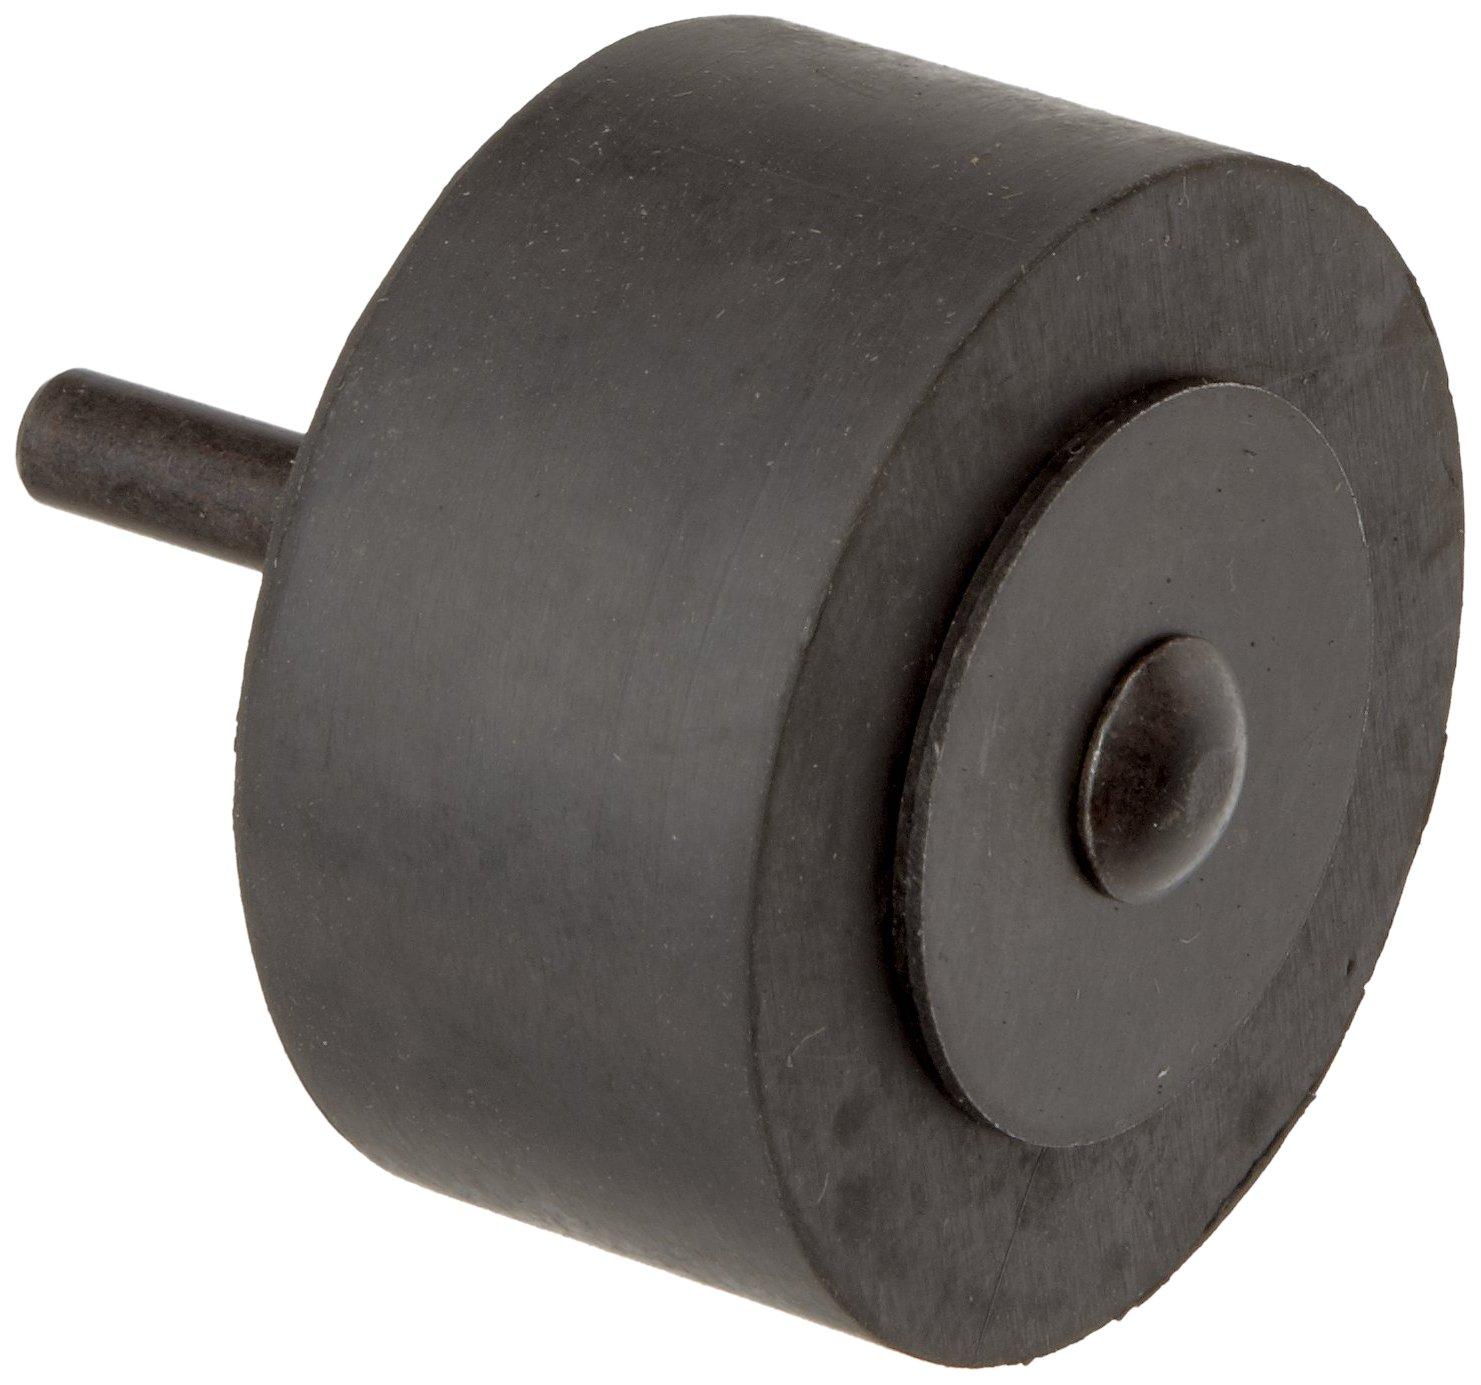 Merit Rubber Expanding Drum for Sanding Sleeves, 1/4' Shank Diameter, 2' Drum Diameter x 1' Drum Width 1/4 Shank Diameter 2 Drum Diameter x 1 Drum Width St. Gobain Abrasives 08834196926